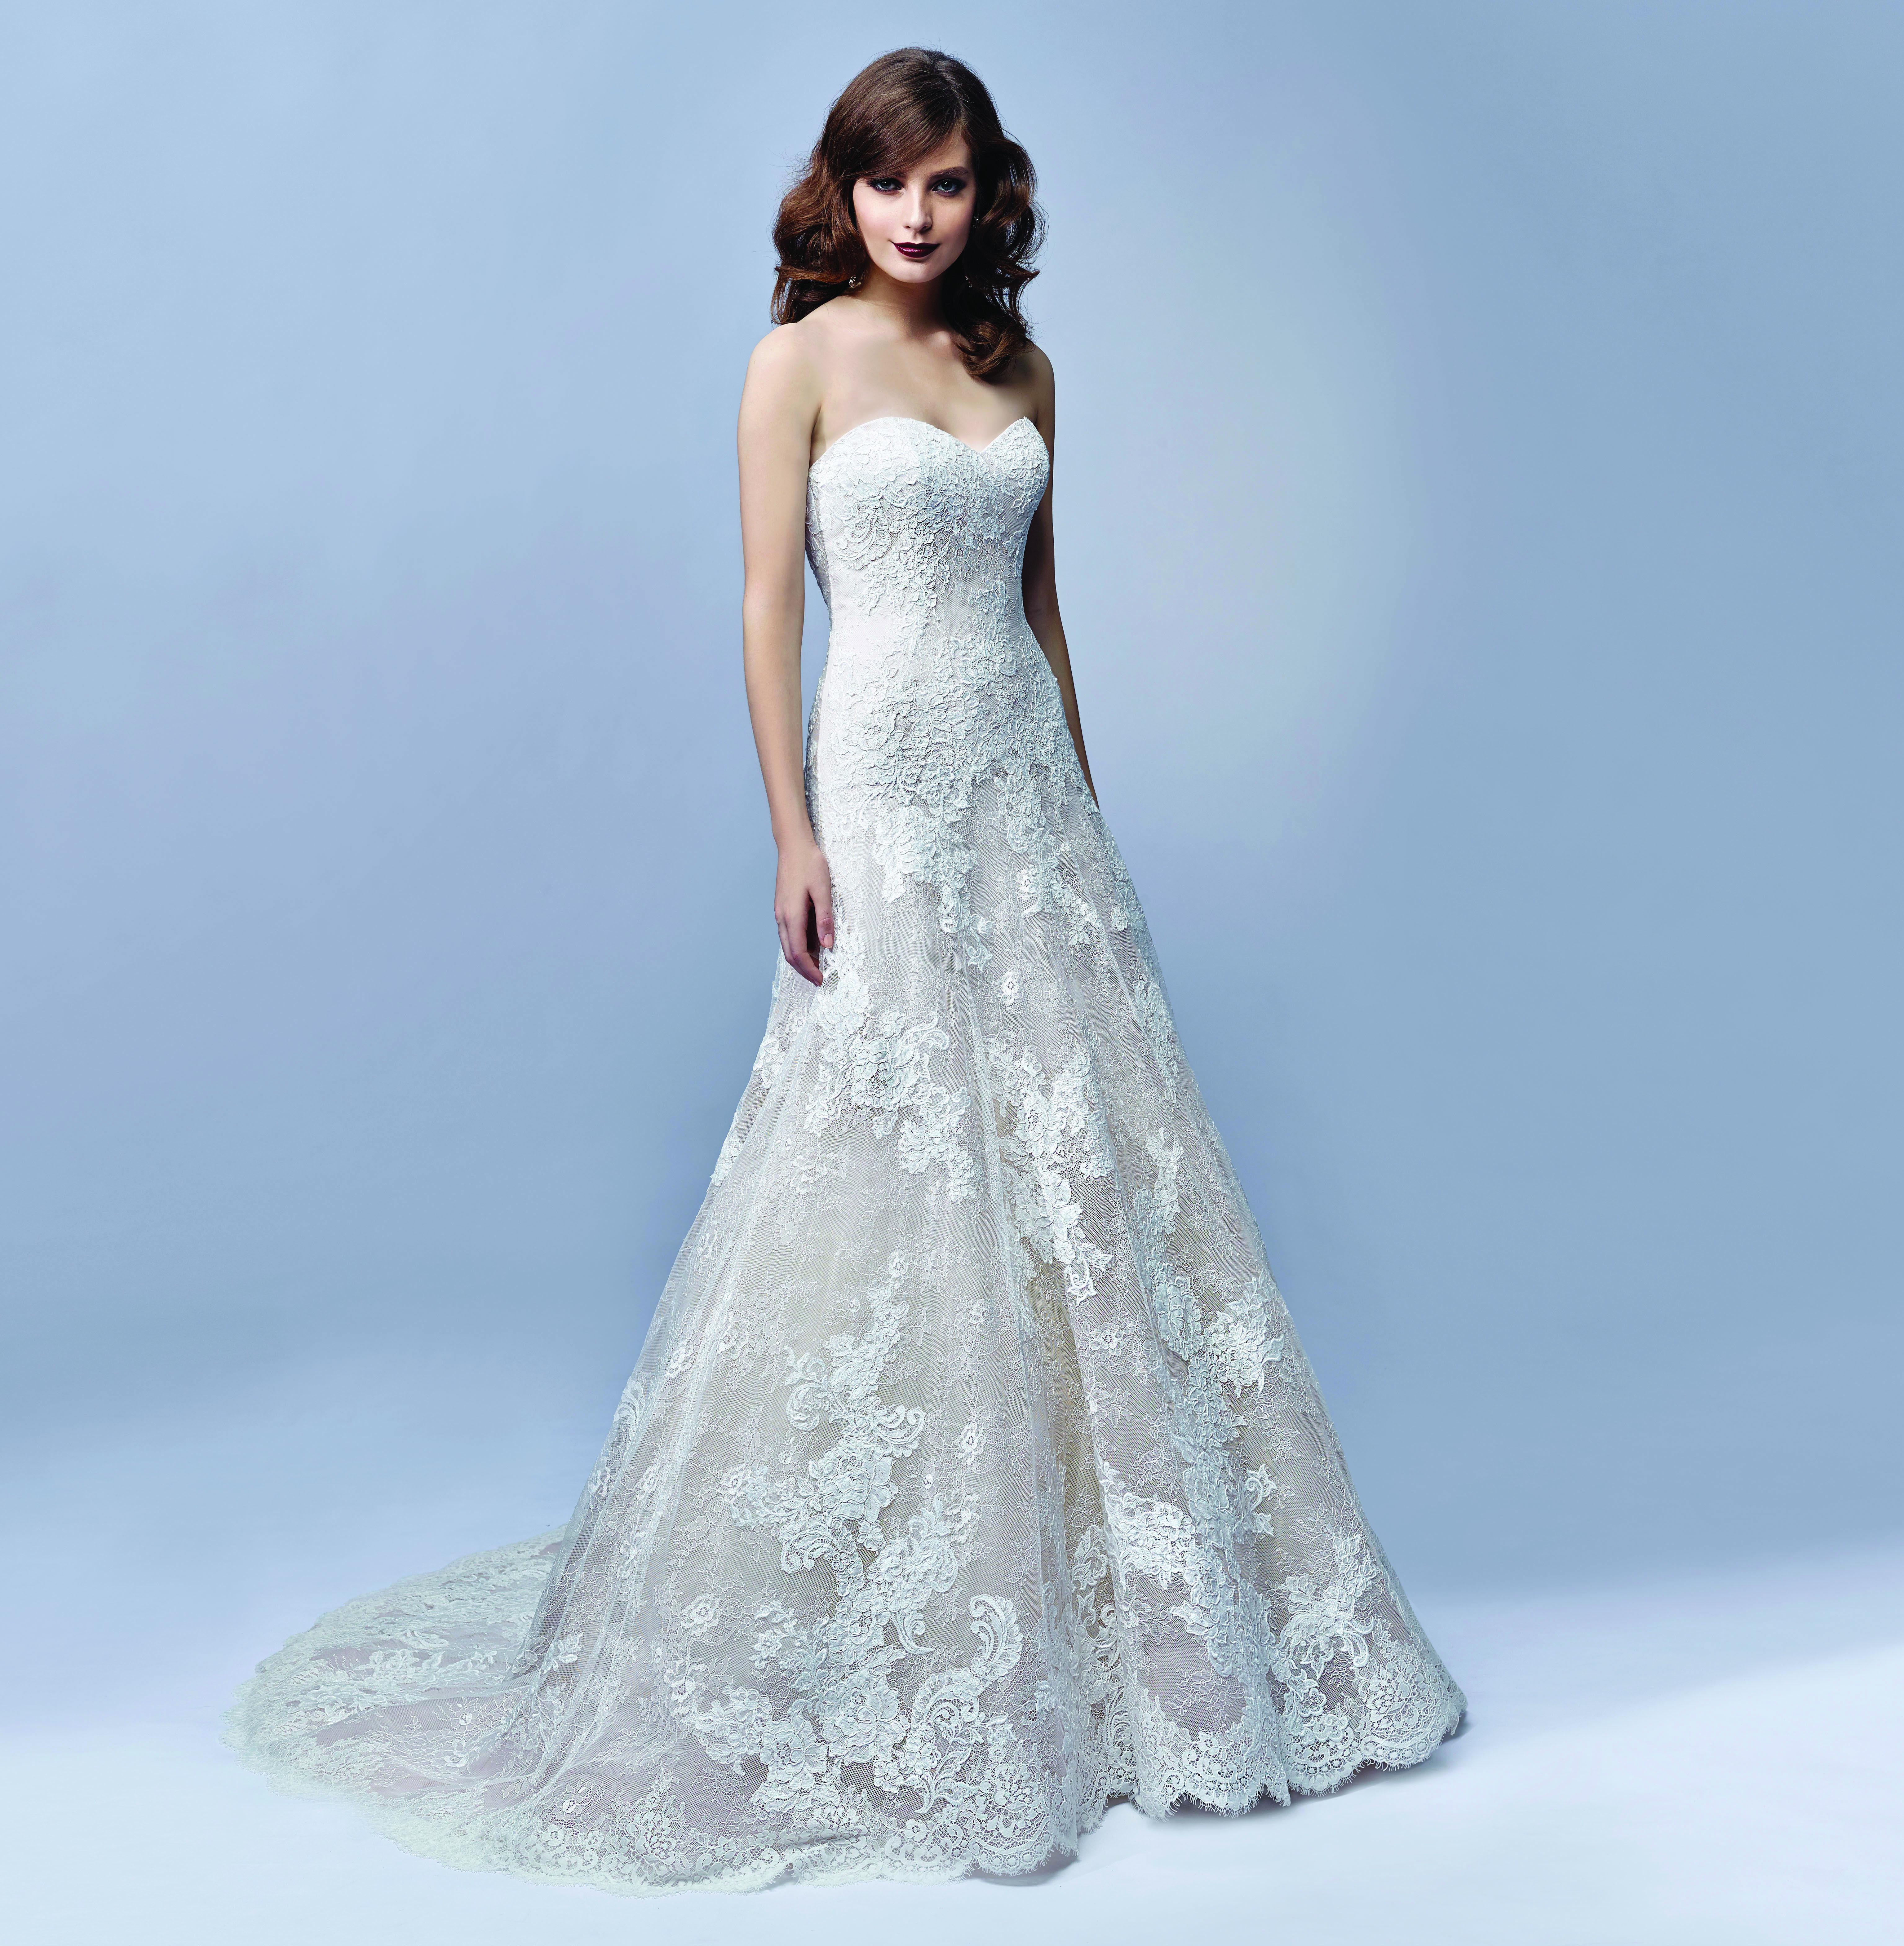 Sweetheart strapless wedding dress  Enzoani bridalwear Joy design from the Enzoani Blue  collection